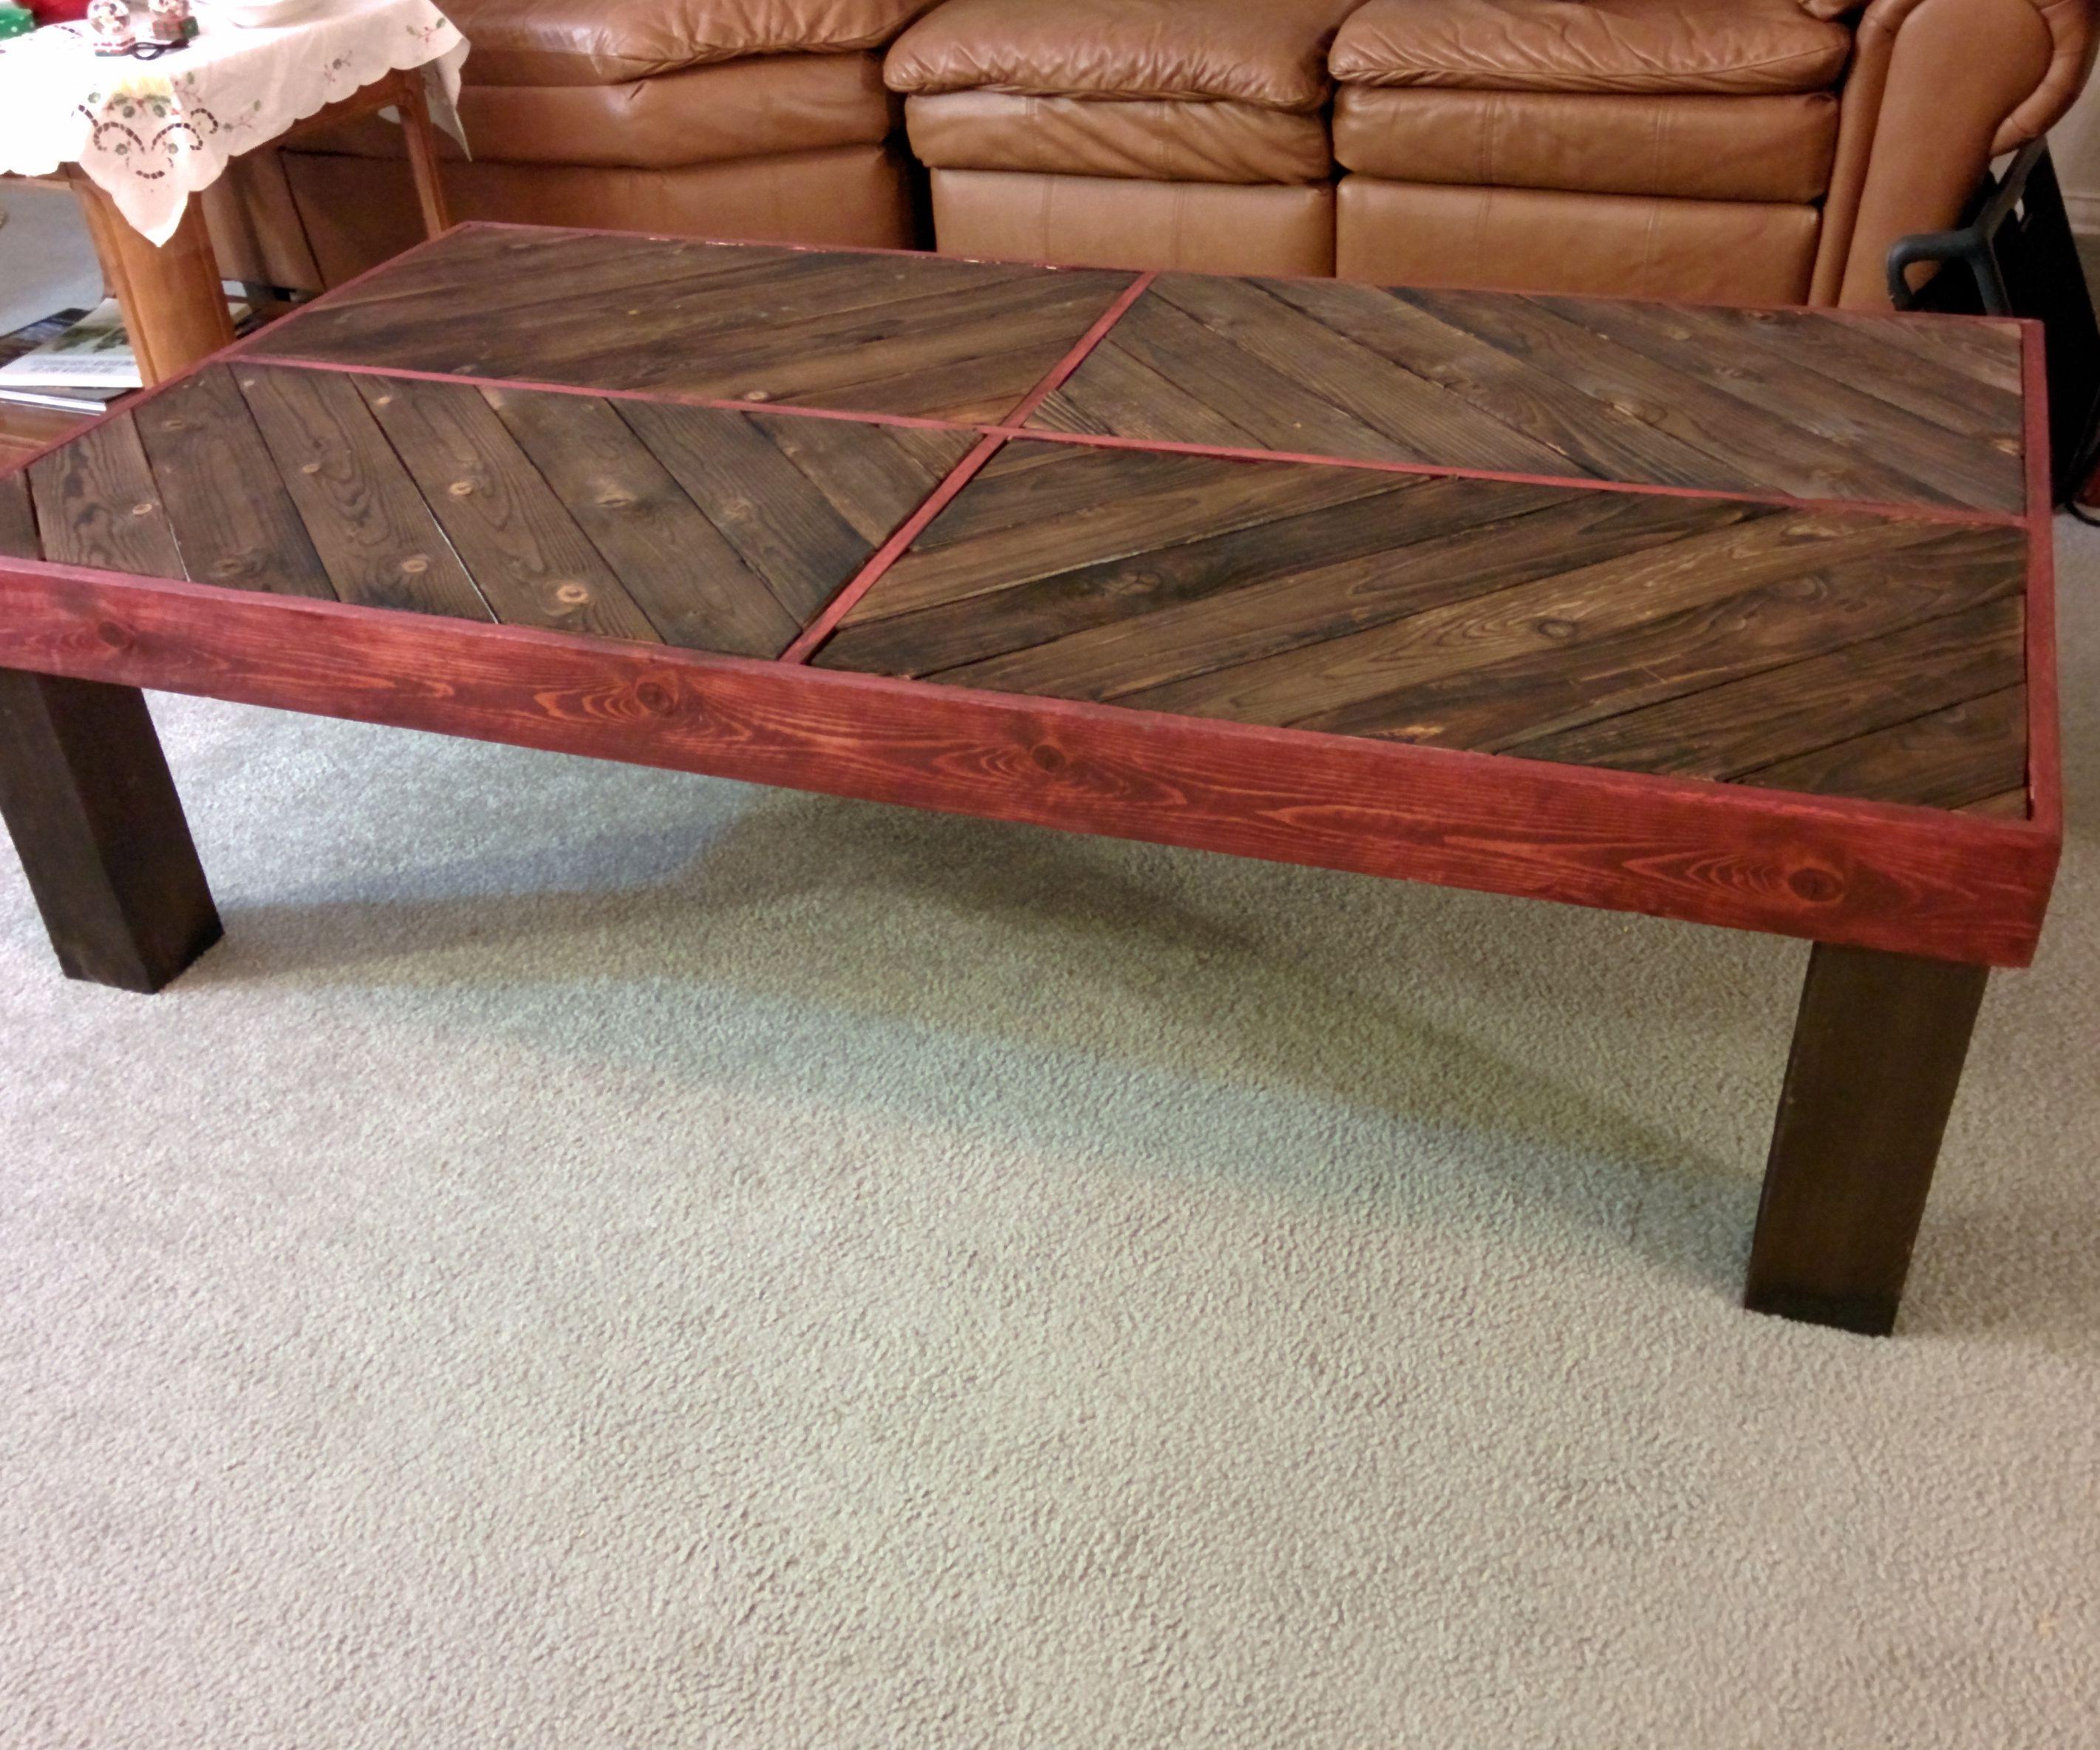 Using Shou Sugi Ban to make an interesting coffee table